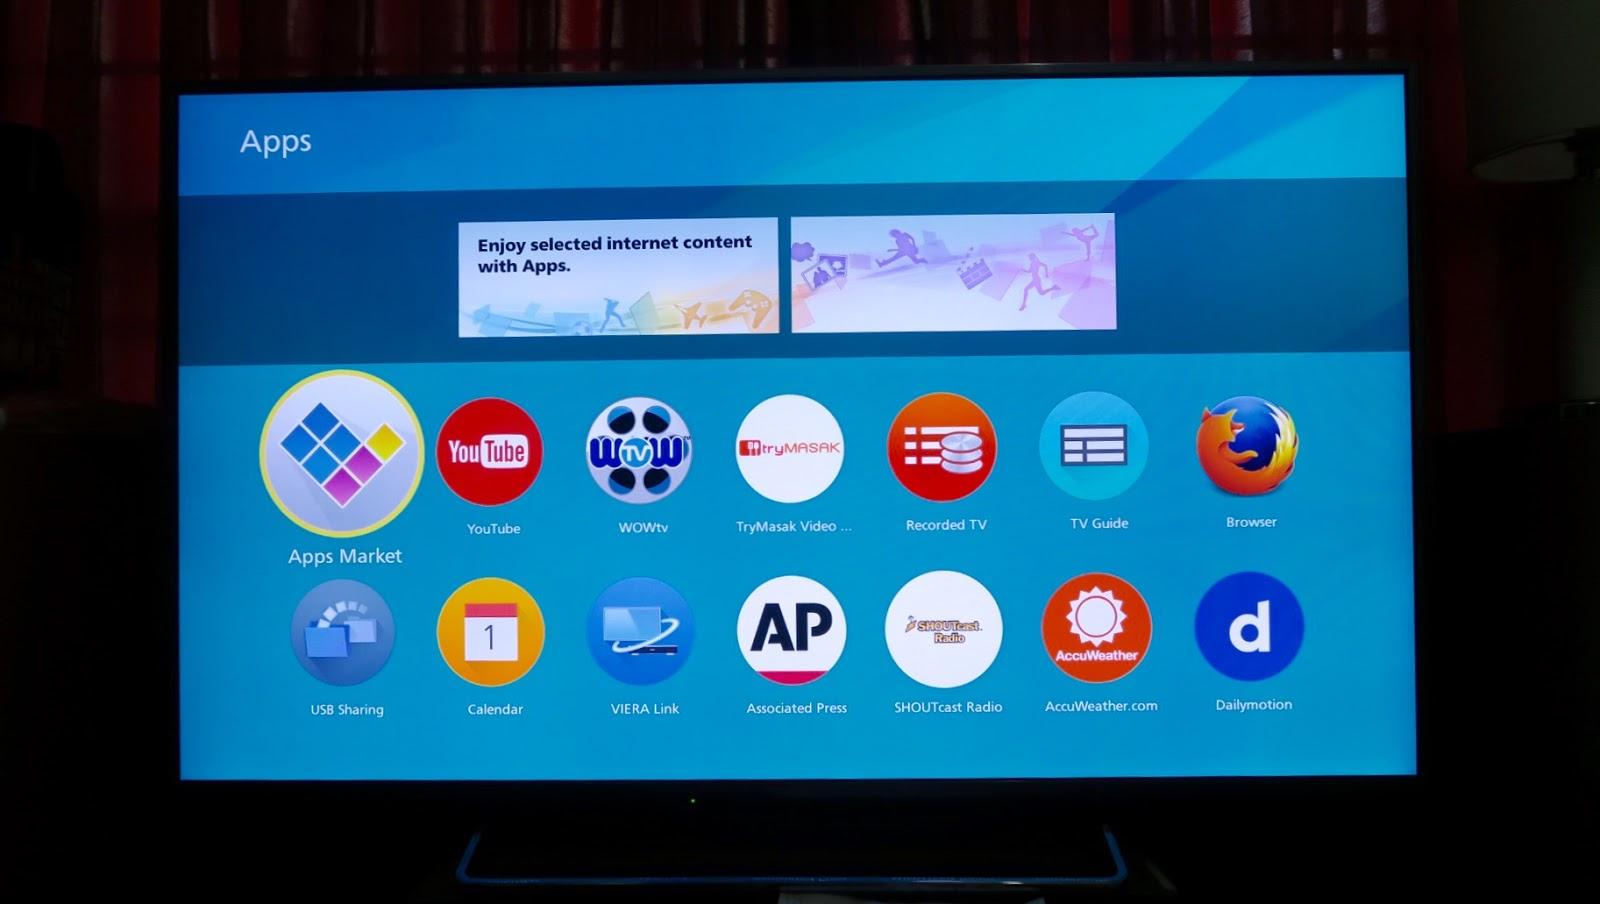 Blog Indonesia Page 4066 Of 4068 Huawei Mifi Pahe Grapari Mataram Nah Melihat Perkembangan Tv Yang Segitu Gilanya Gue Merasa Bersyukur Pernah Hidup Cukup Lama Untuk Menyaksikan Evolusi Teknologi